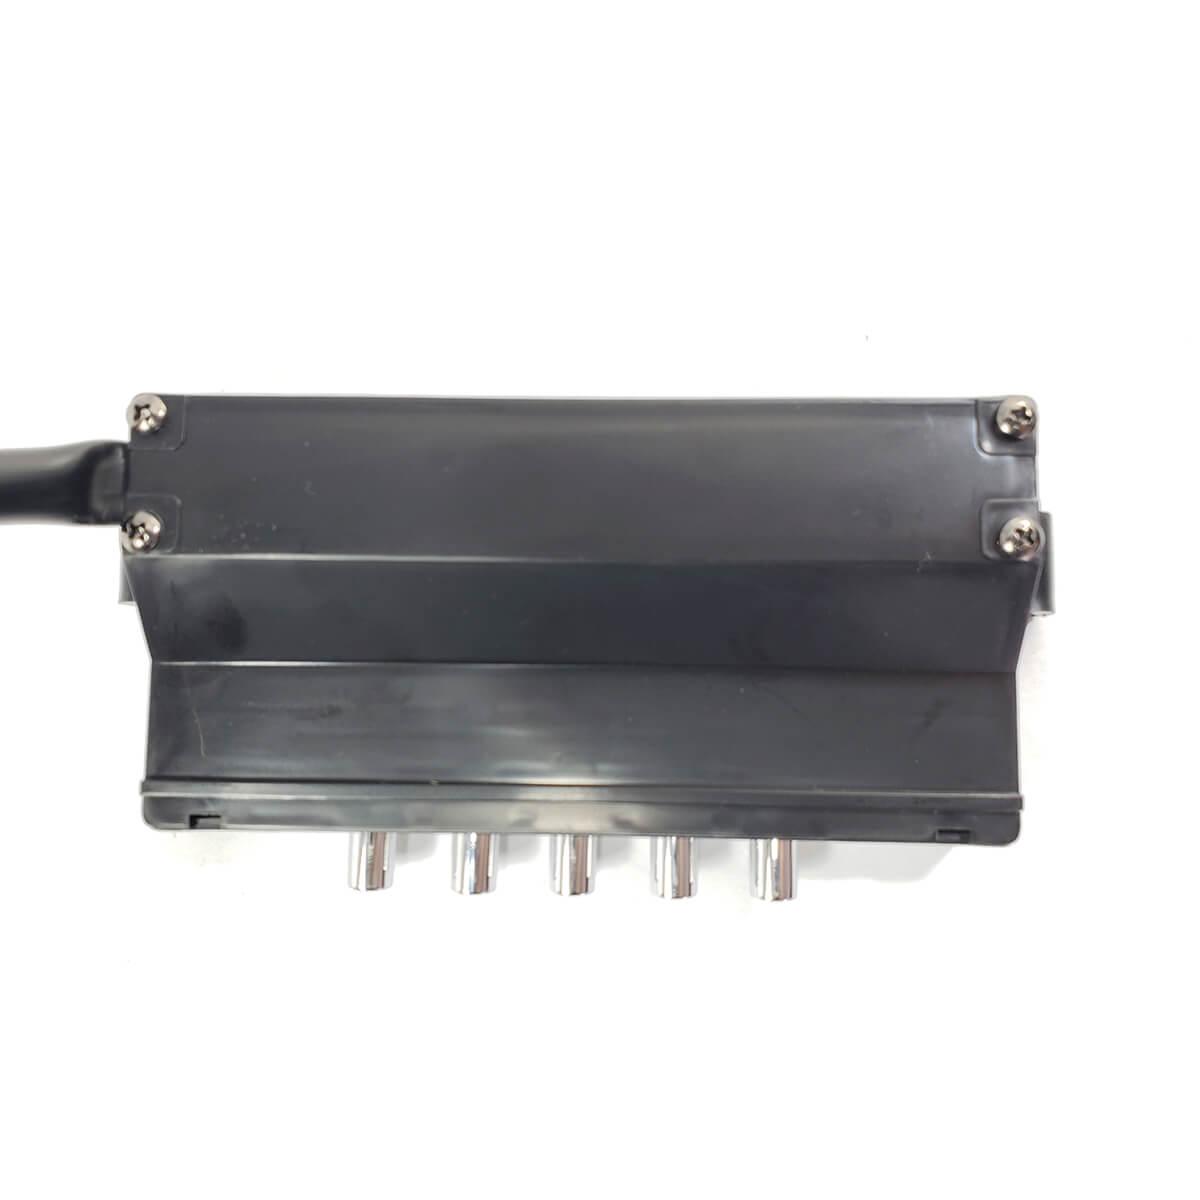 Interruptor Com Led Azul Para Coifa Electrolux - E251050